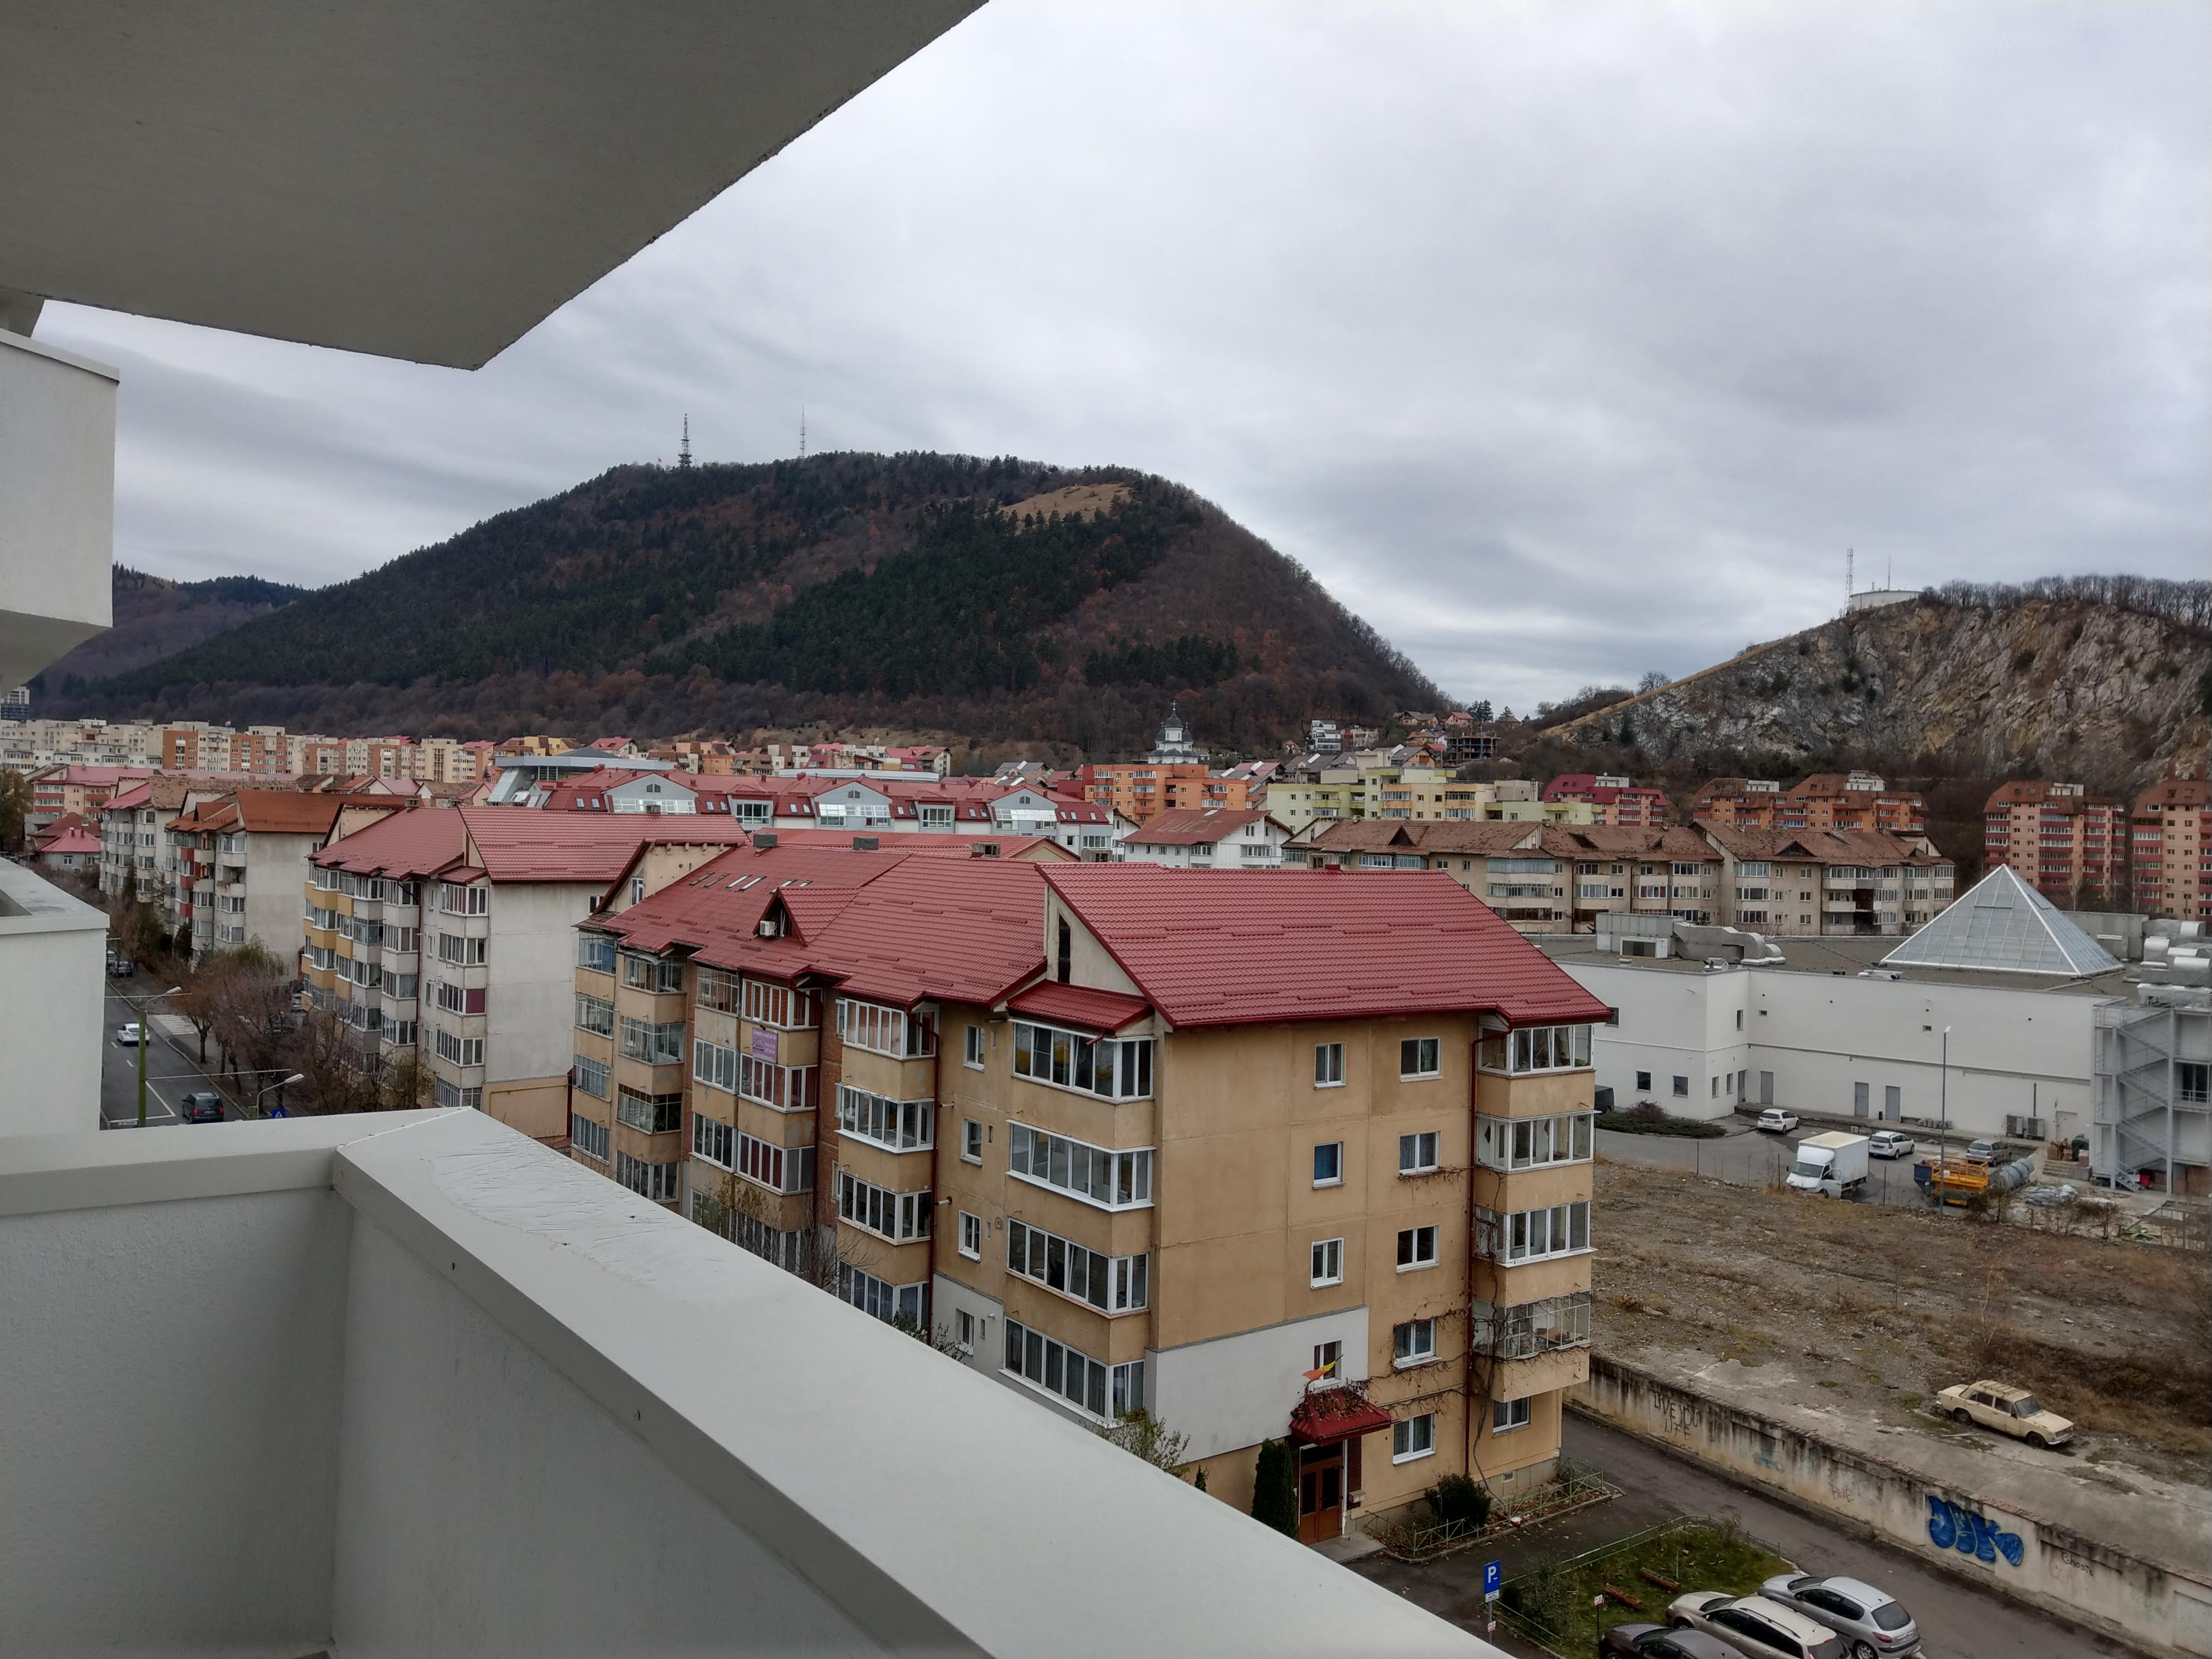 Chirie 2 camere de inchiriat constructie 2018 Brasov